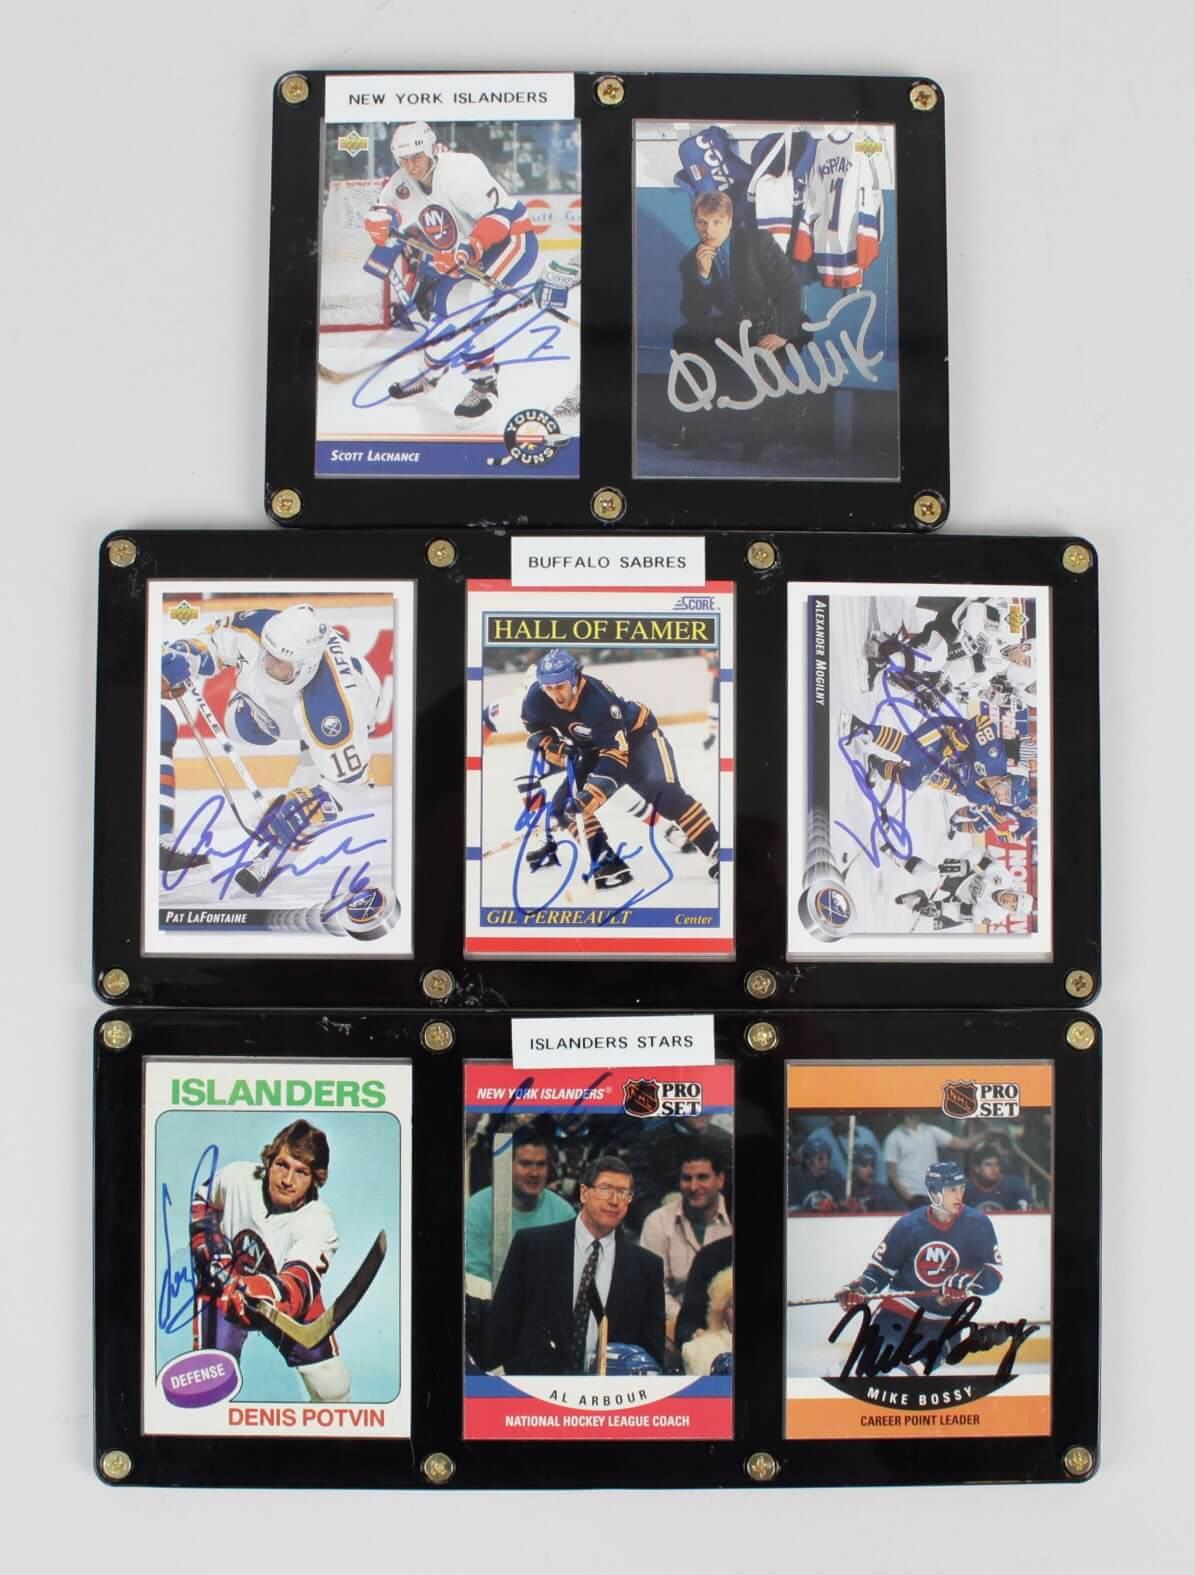 Islanders & Sabres Signed 7 Cards Displays Bossy, Potvin, Gil Perreault44237_01